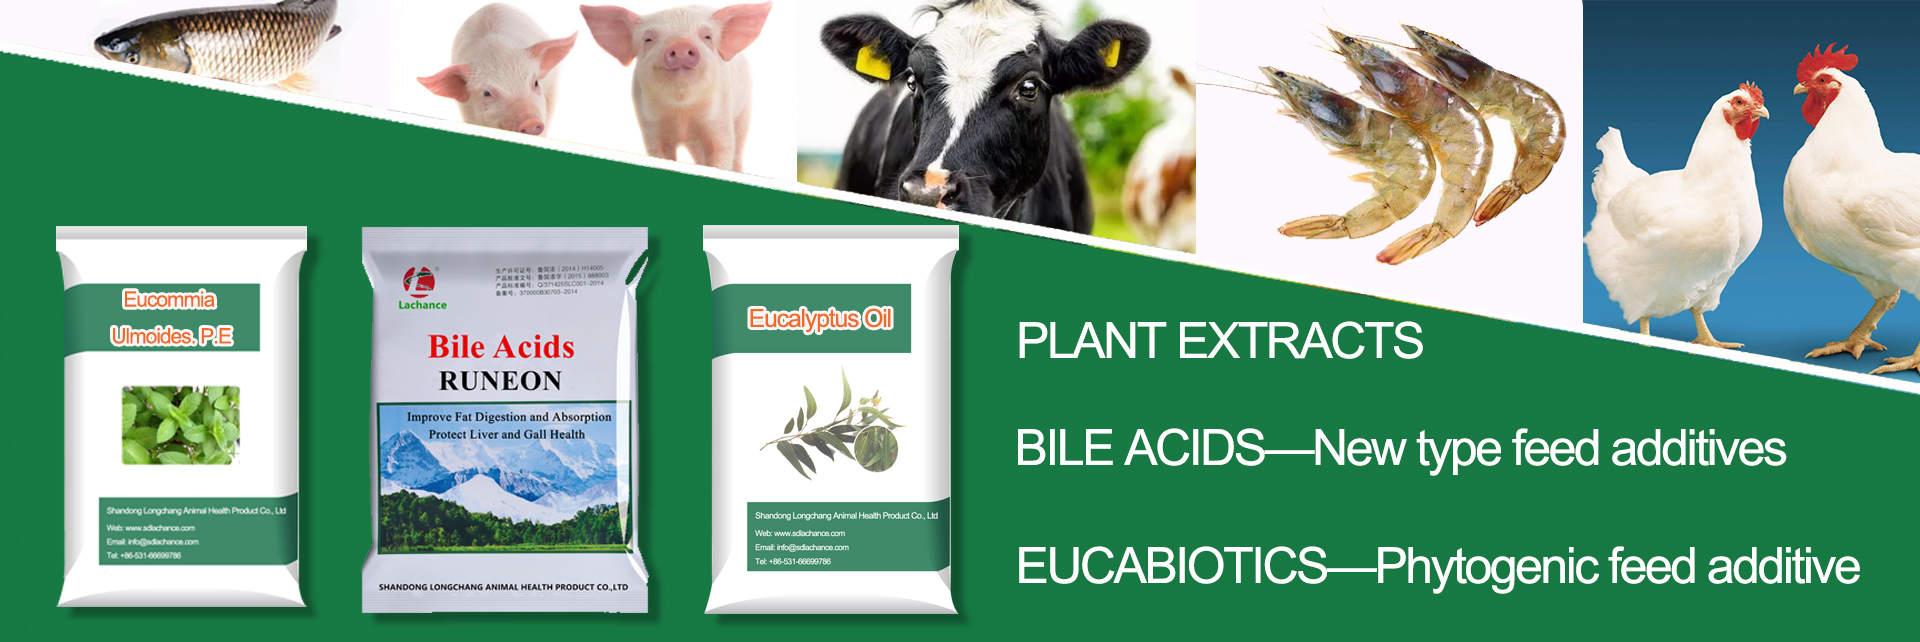 BILE ACIDS-New type feed additives - LACHANCE Bile Acids feed ...